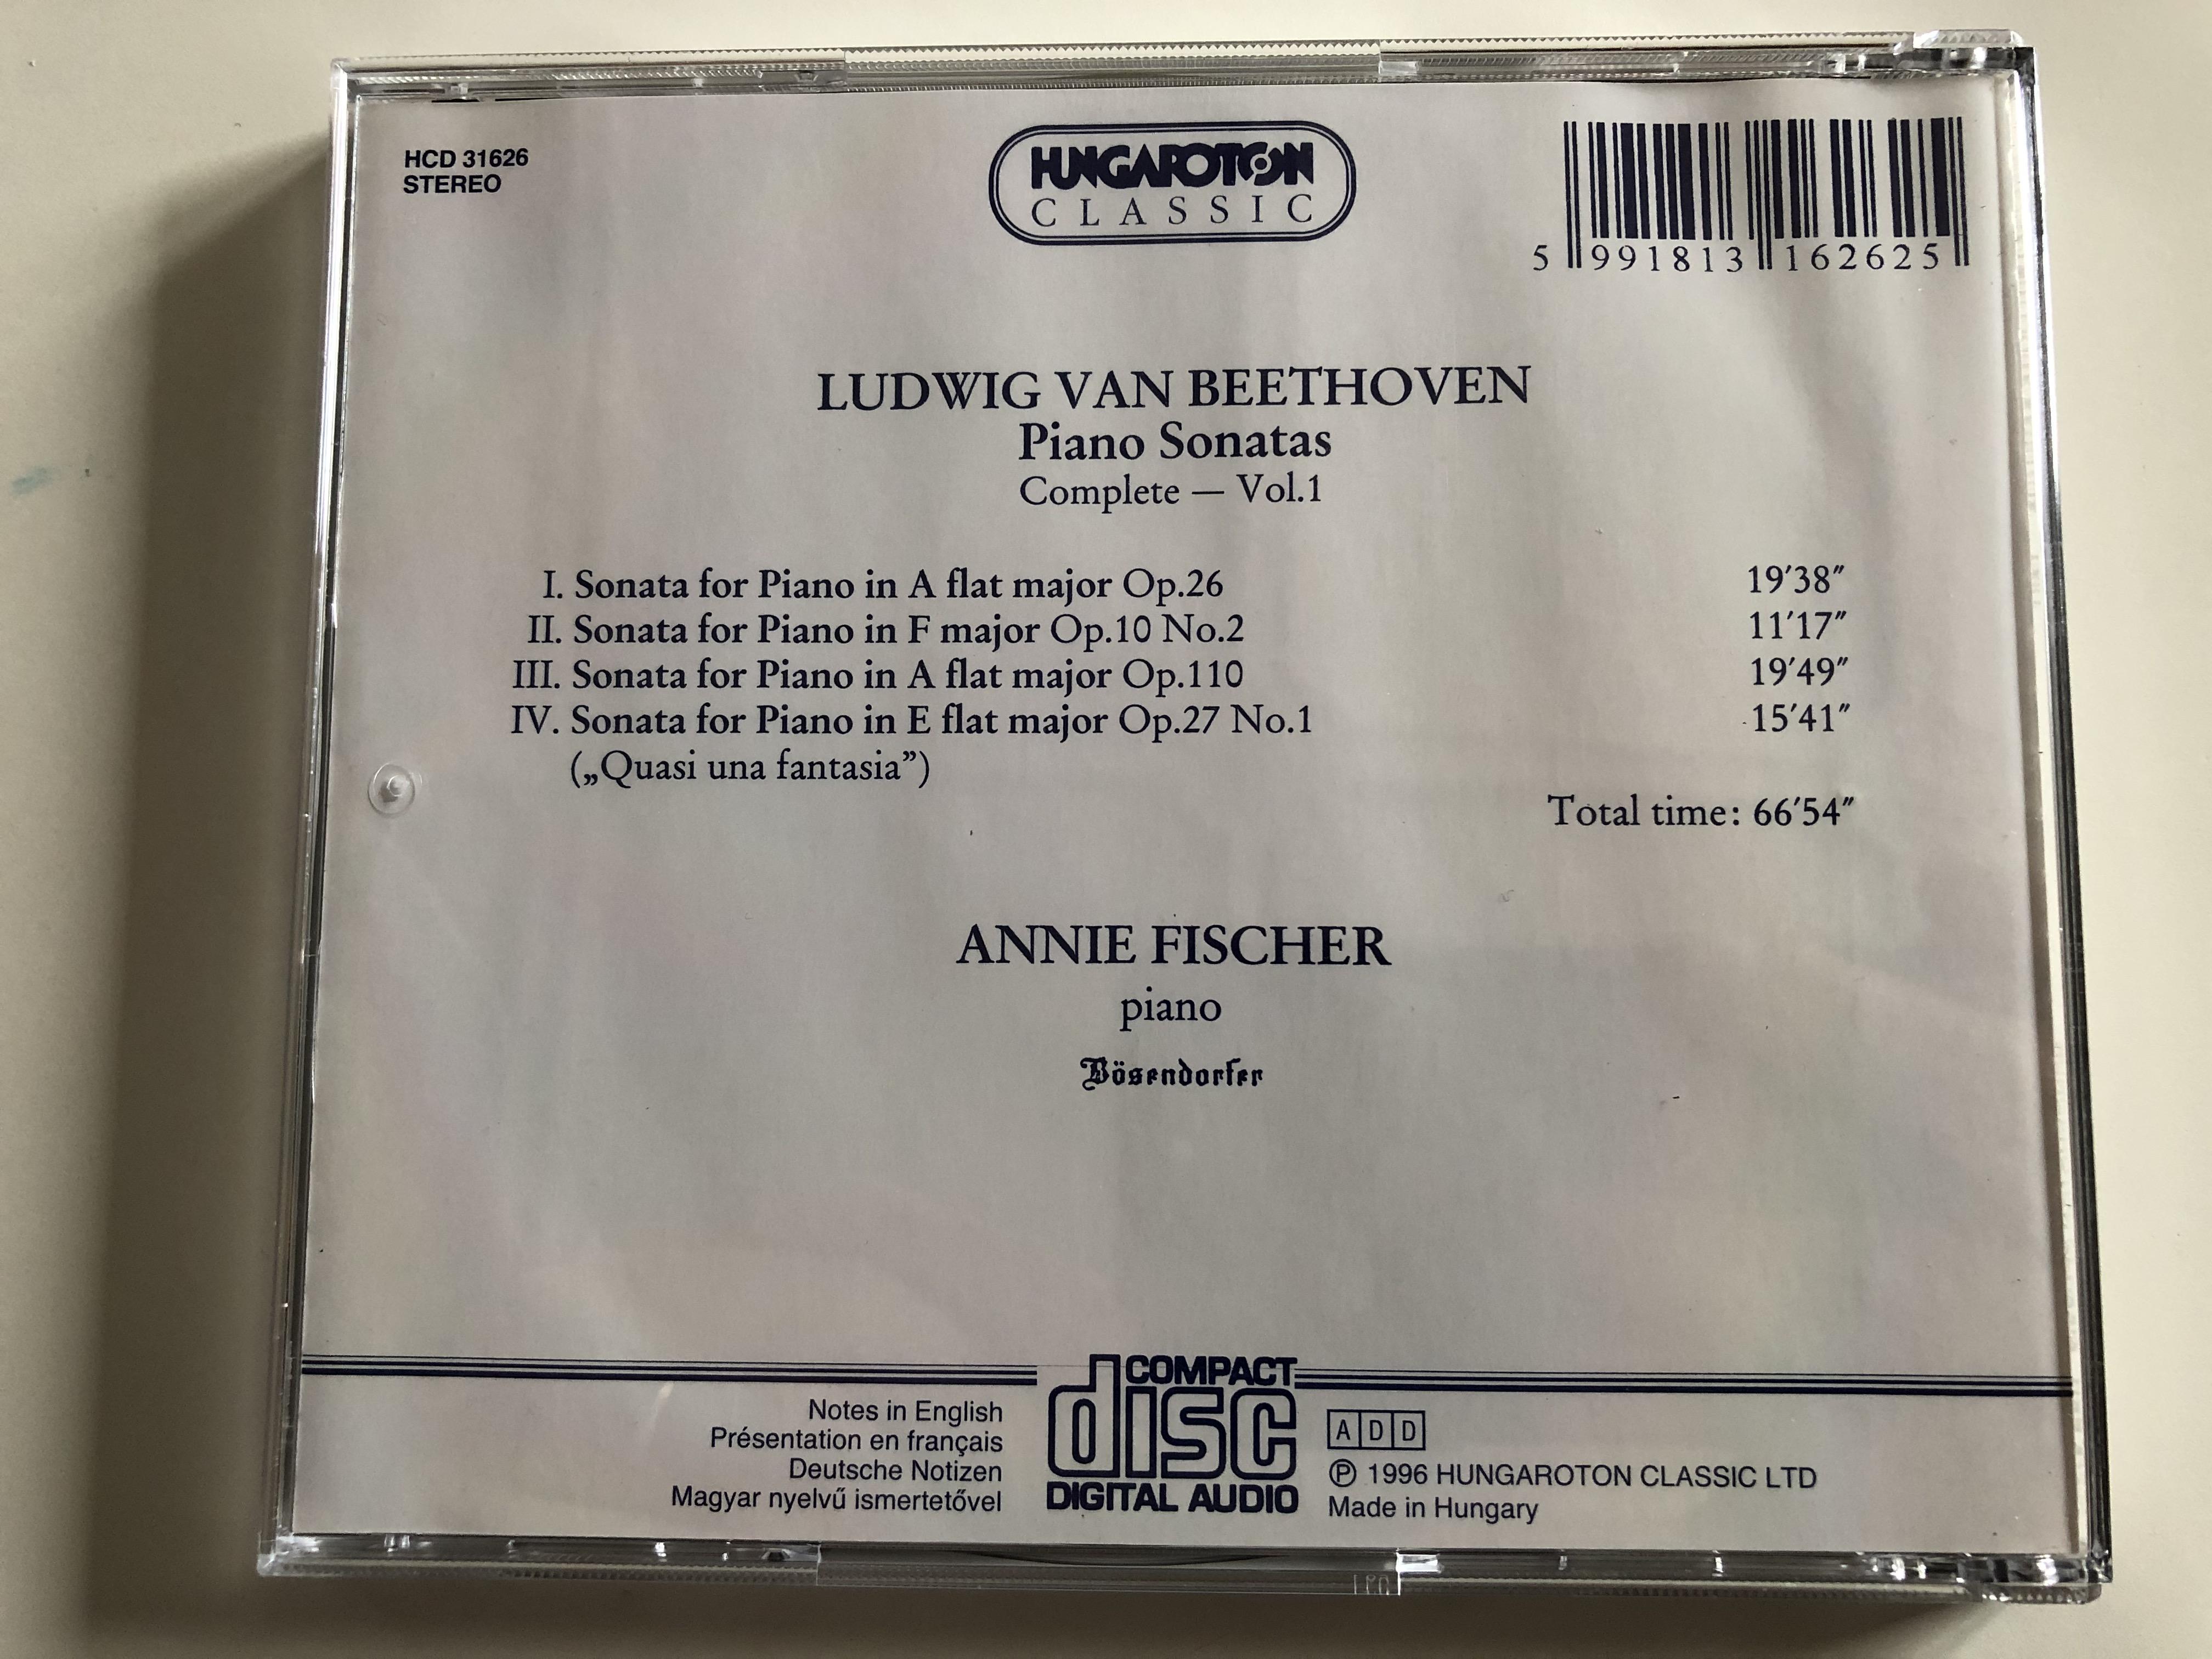 annie-fischer-ludwig-van-beethoven-piano-sonatas-complete-vol.-1-a-flat-major-op.-26-f-major-op.-102-a-flat-major-op.-110-e-flat-major-op.271-hungaroton-classic-audio-cd-1996-stereo-7-.jpg